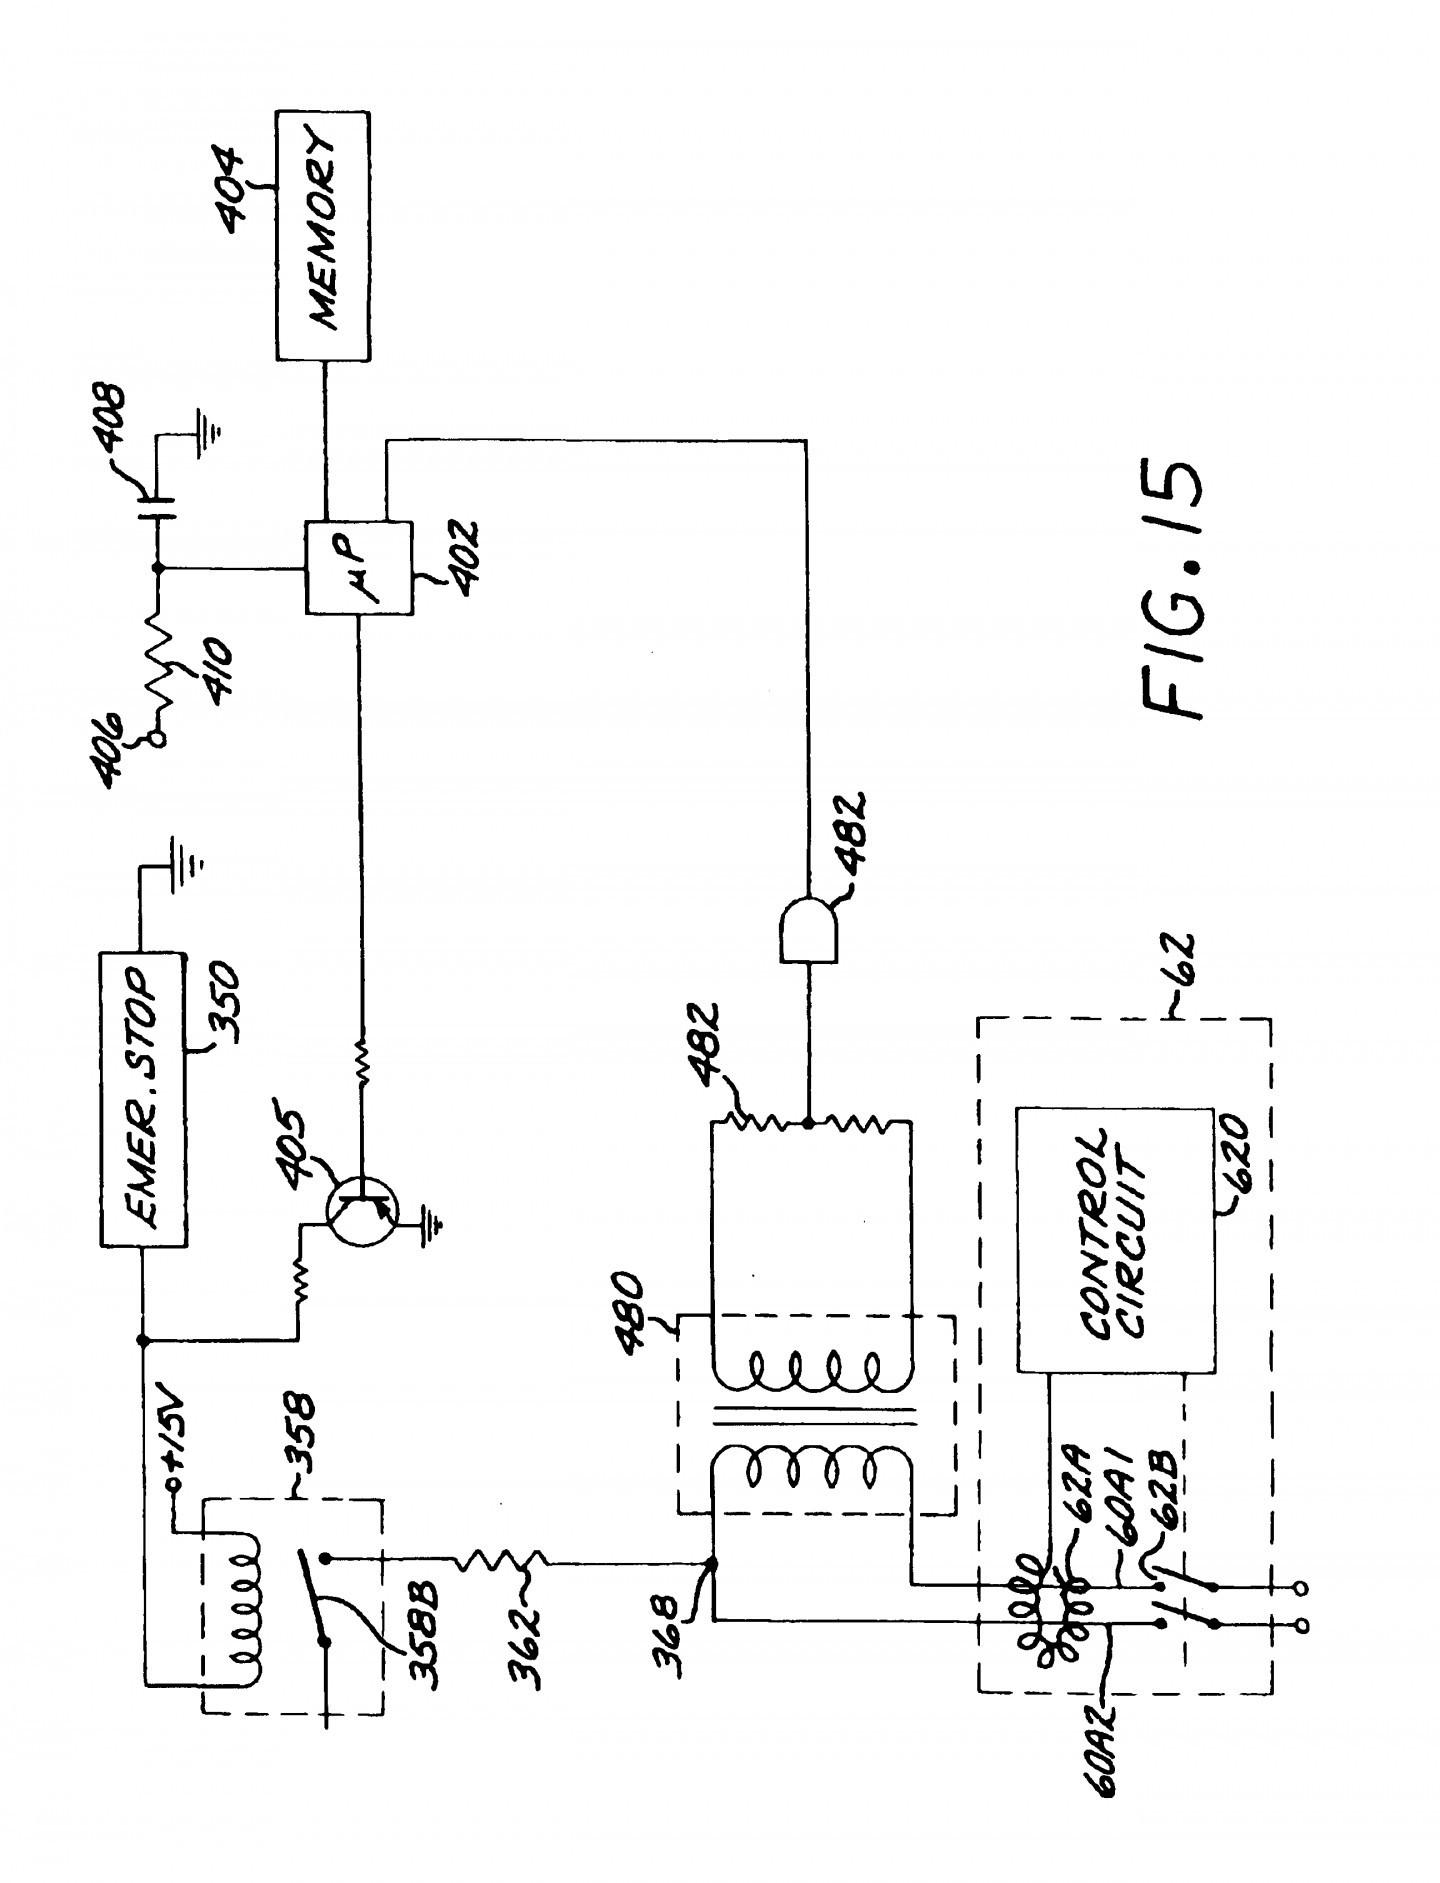 Jandy Pool Control Wiring Diagram